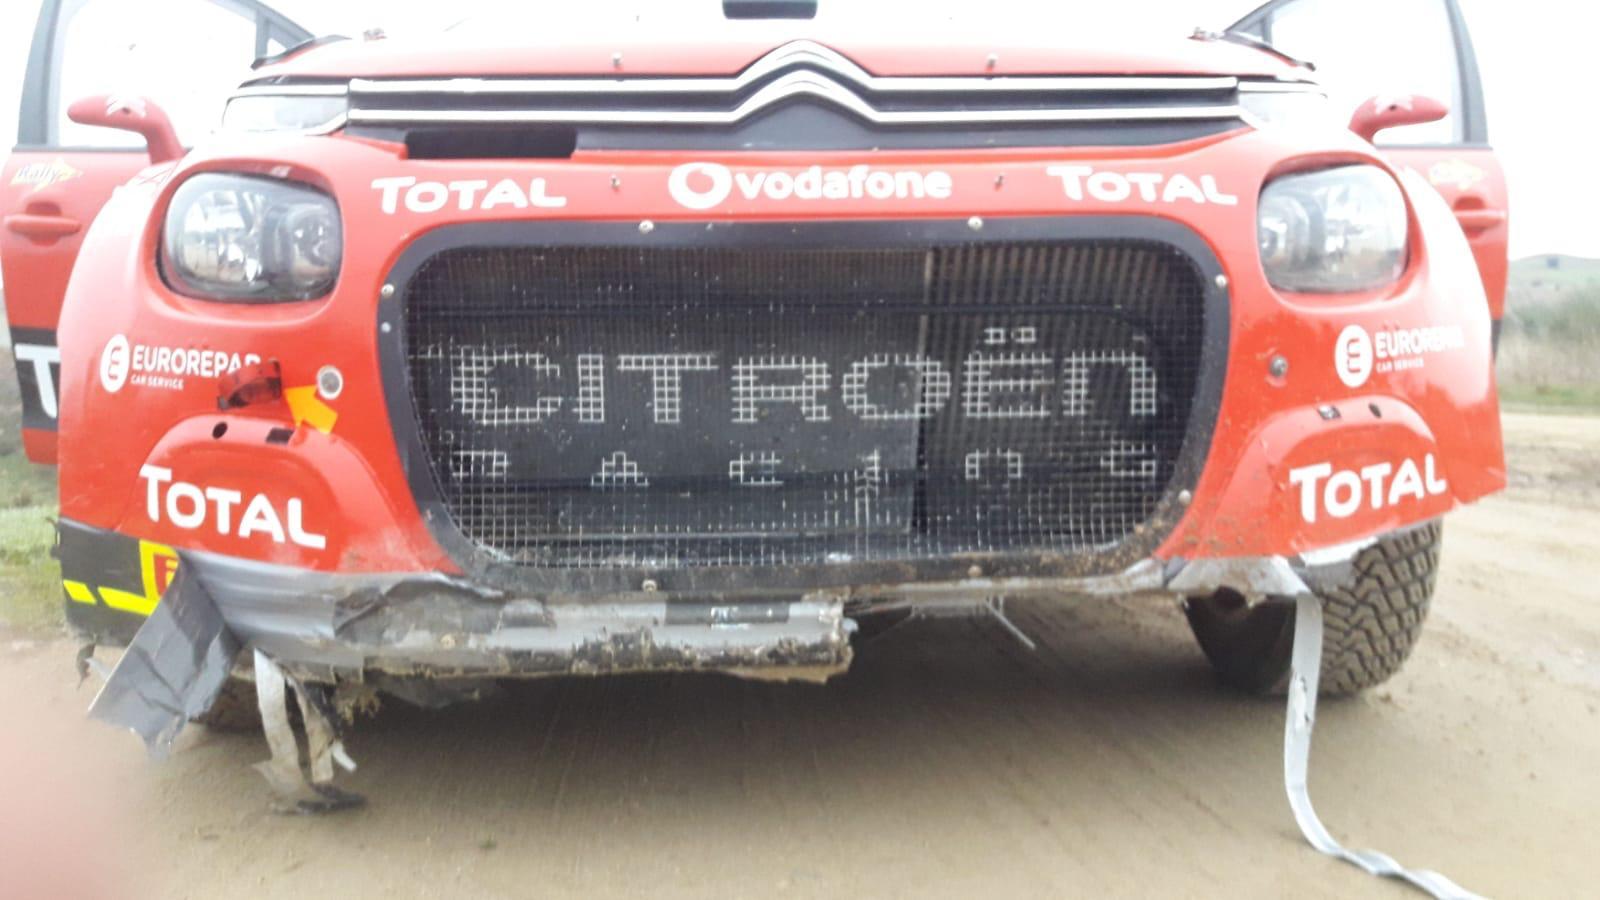 SCER + CERT: Rallye de Tierra de Madrid [13-14 Noviembre] - Página 2 20201114083230